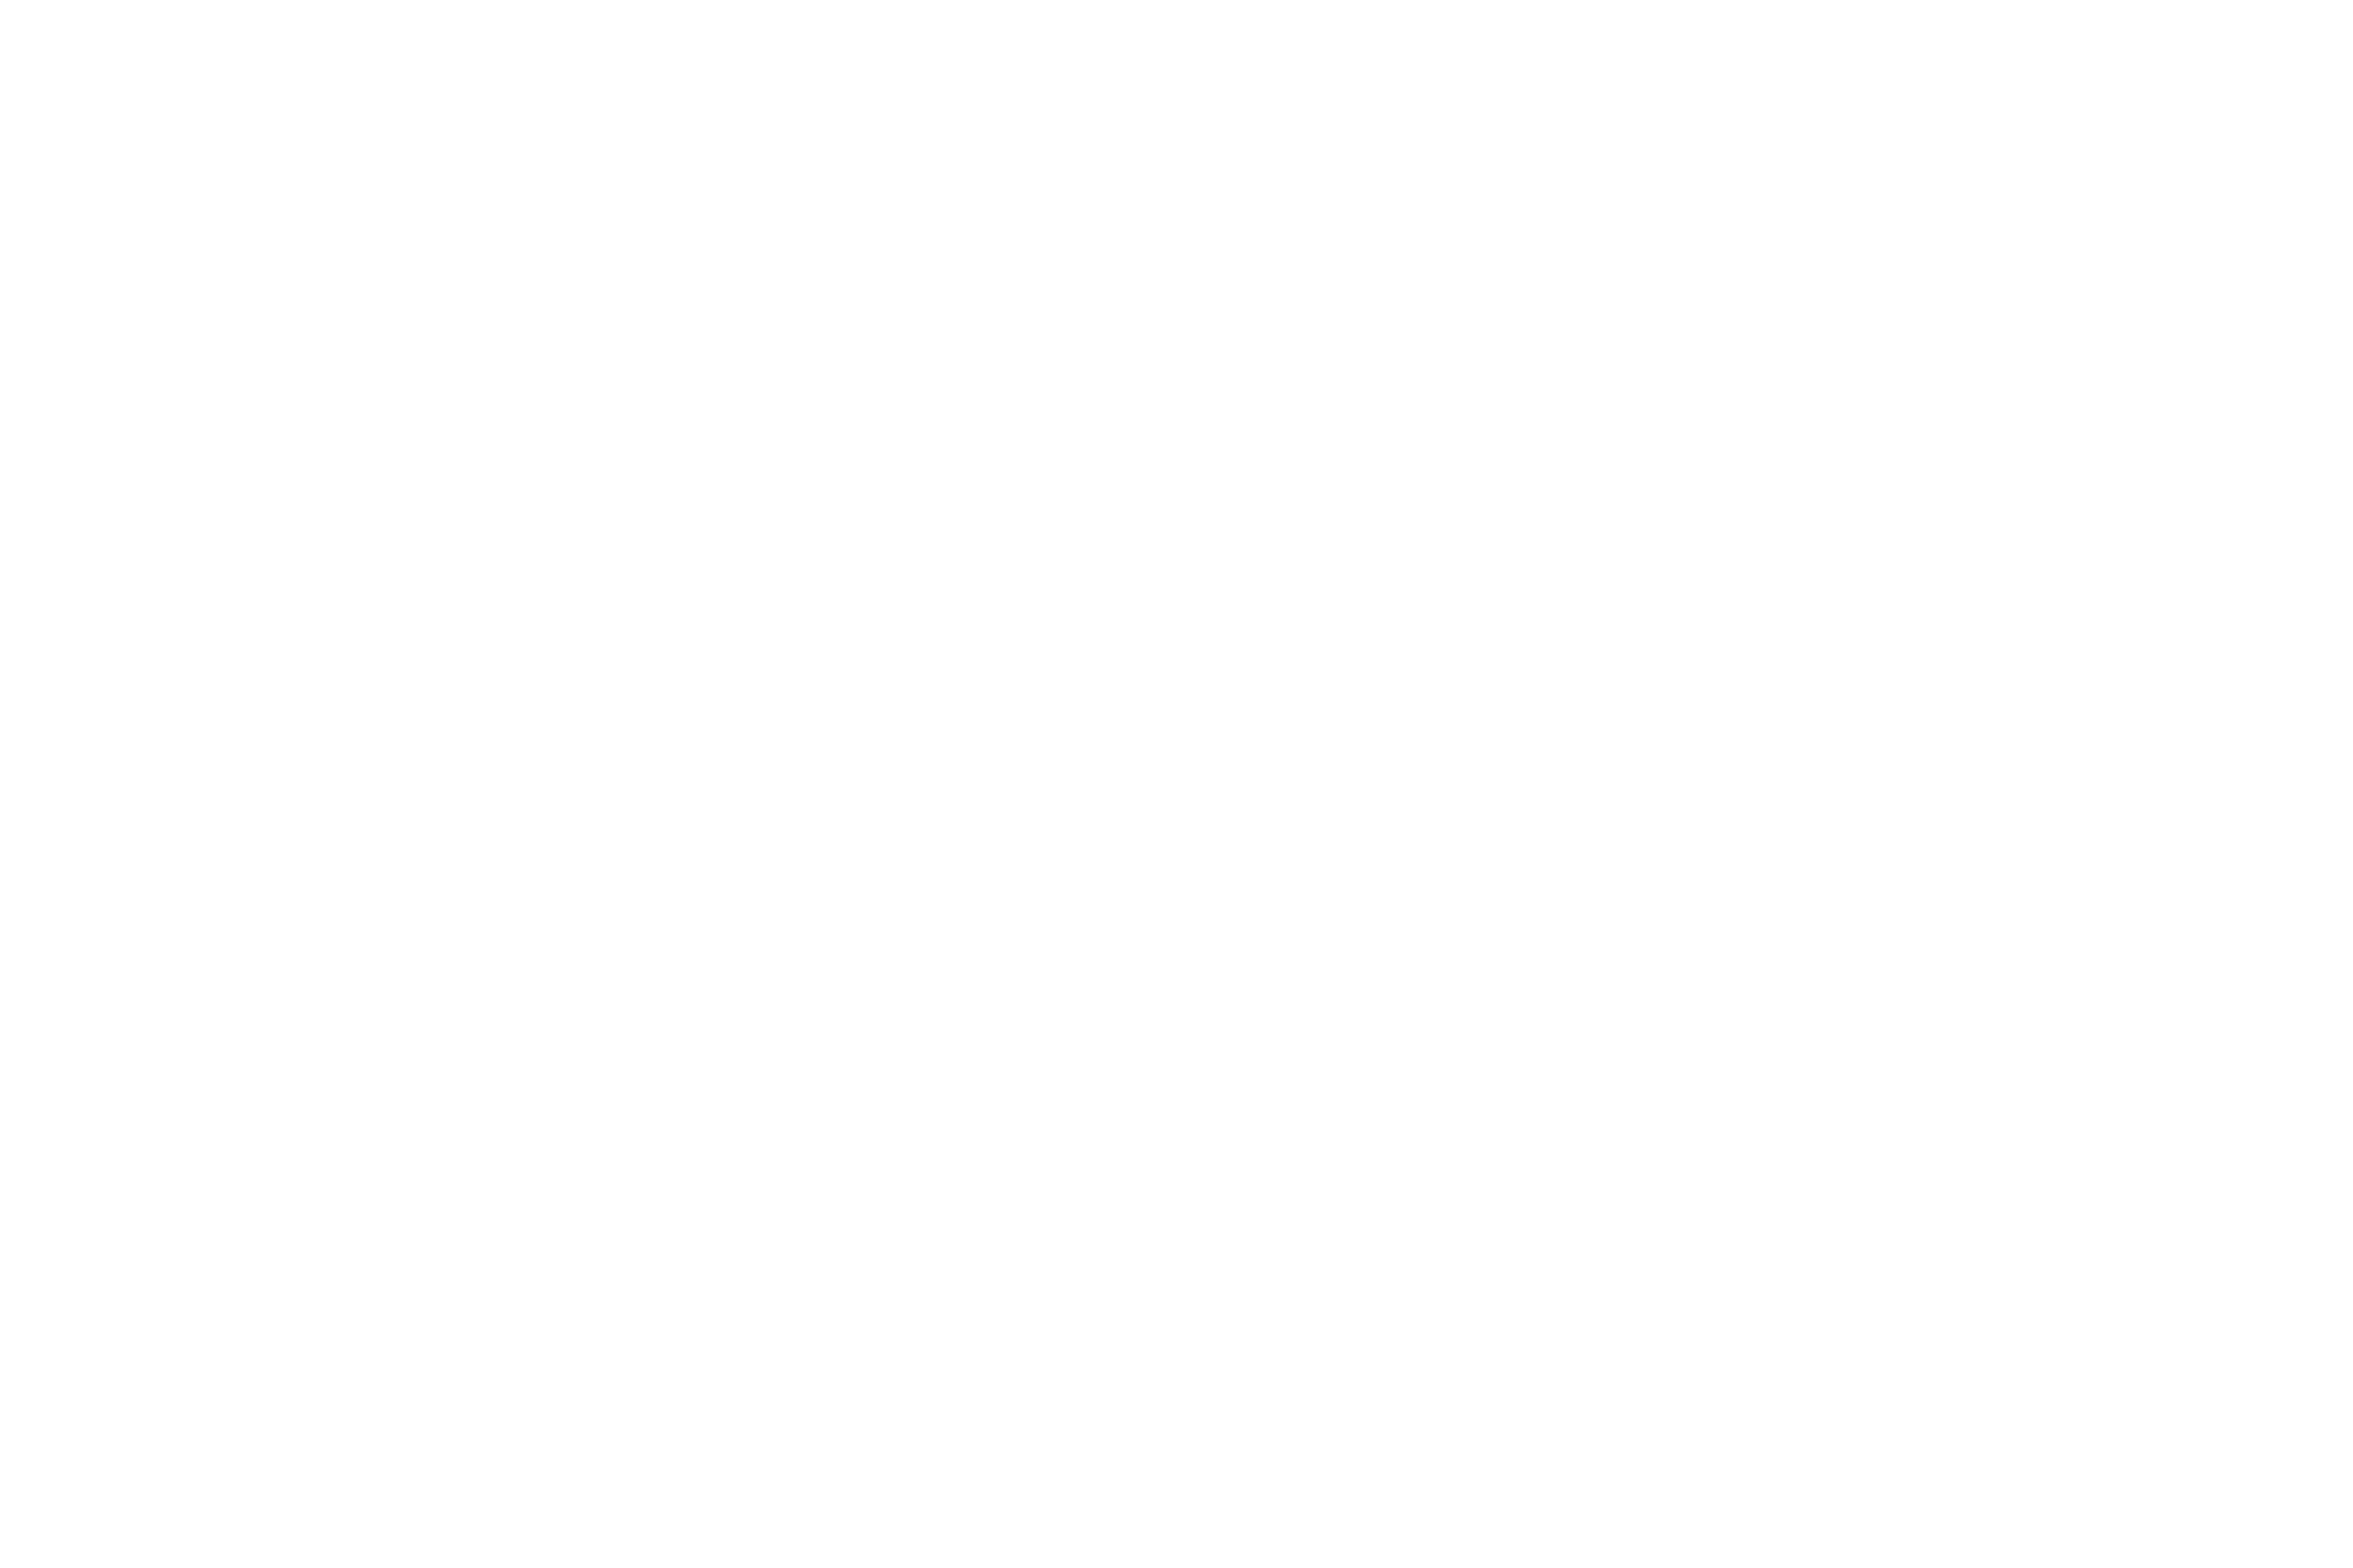 gruppenbild2